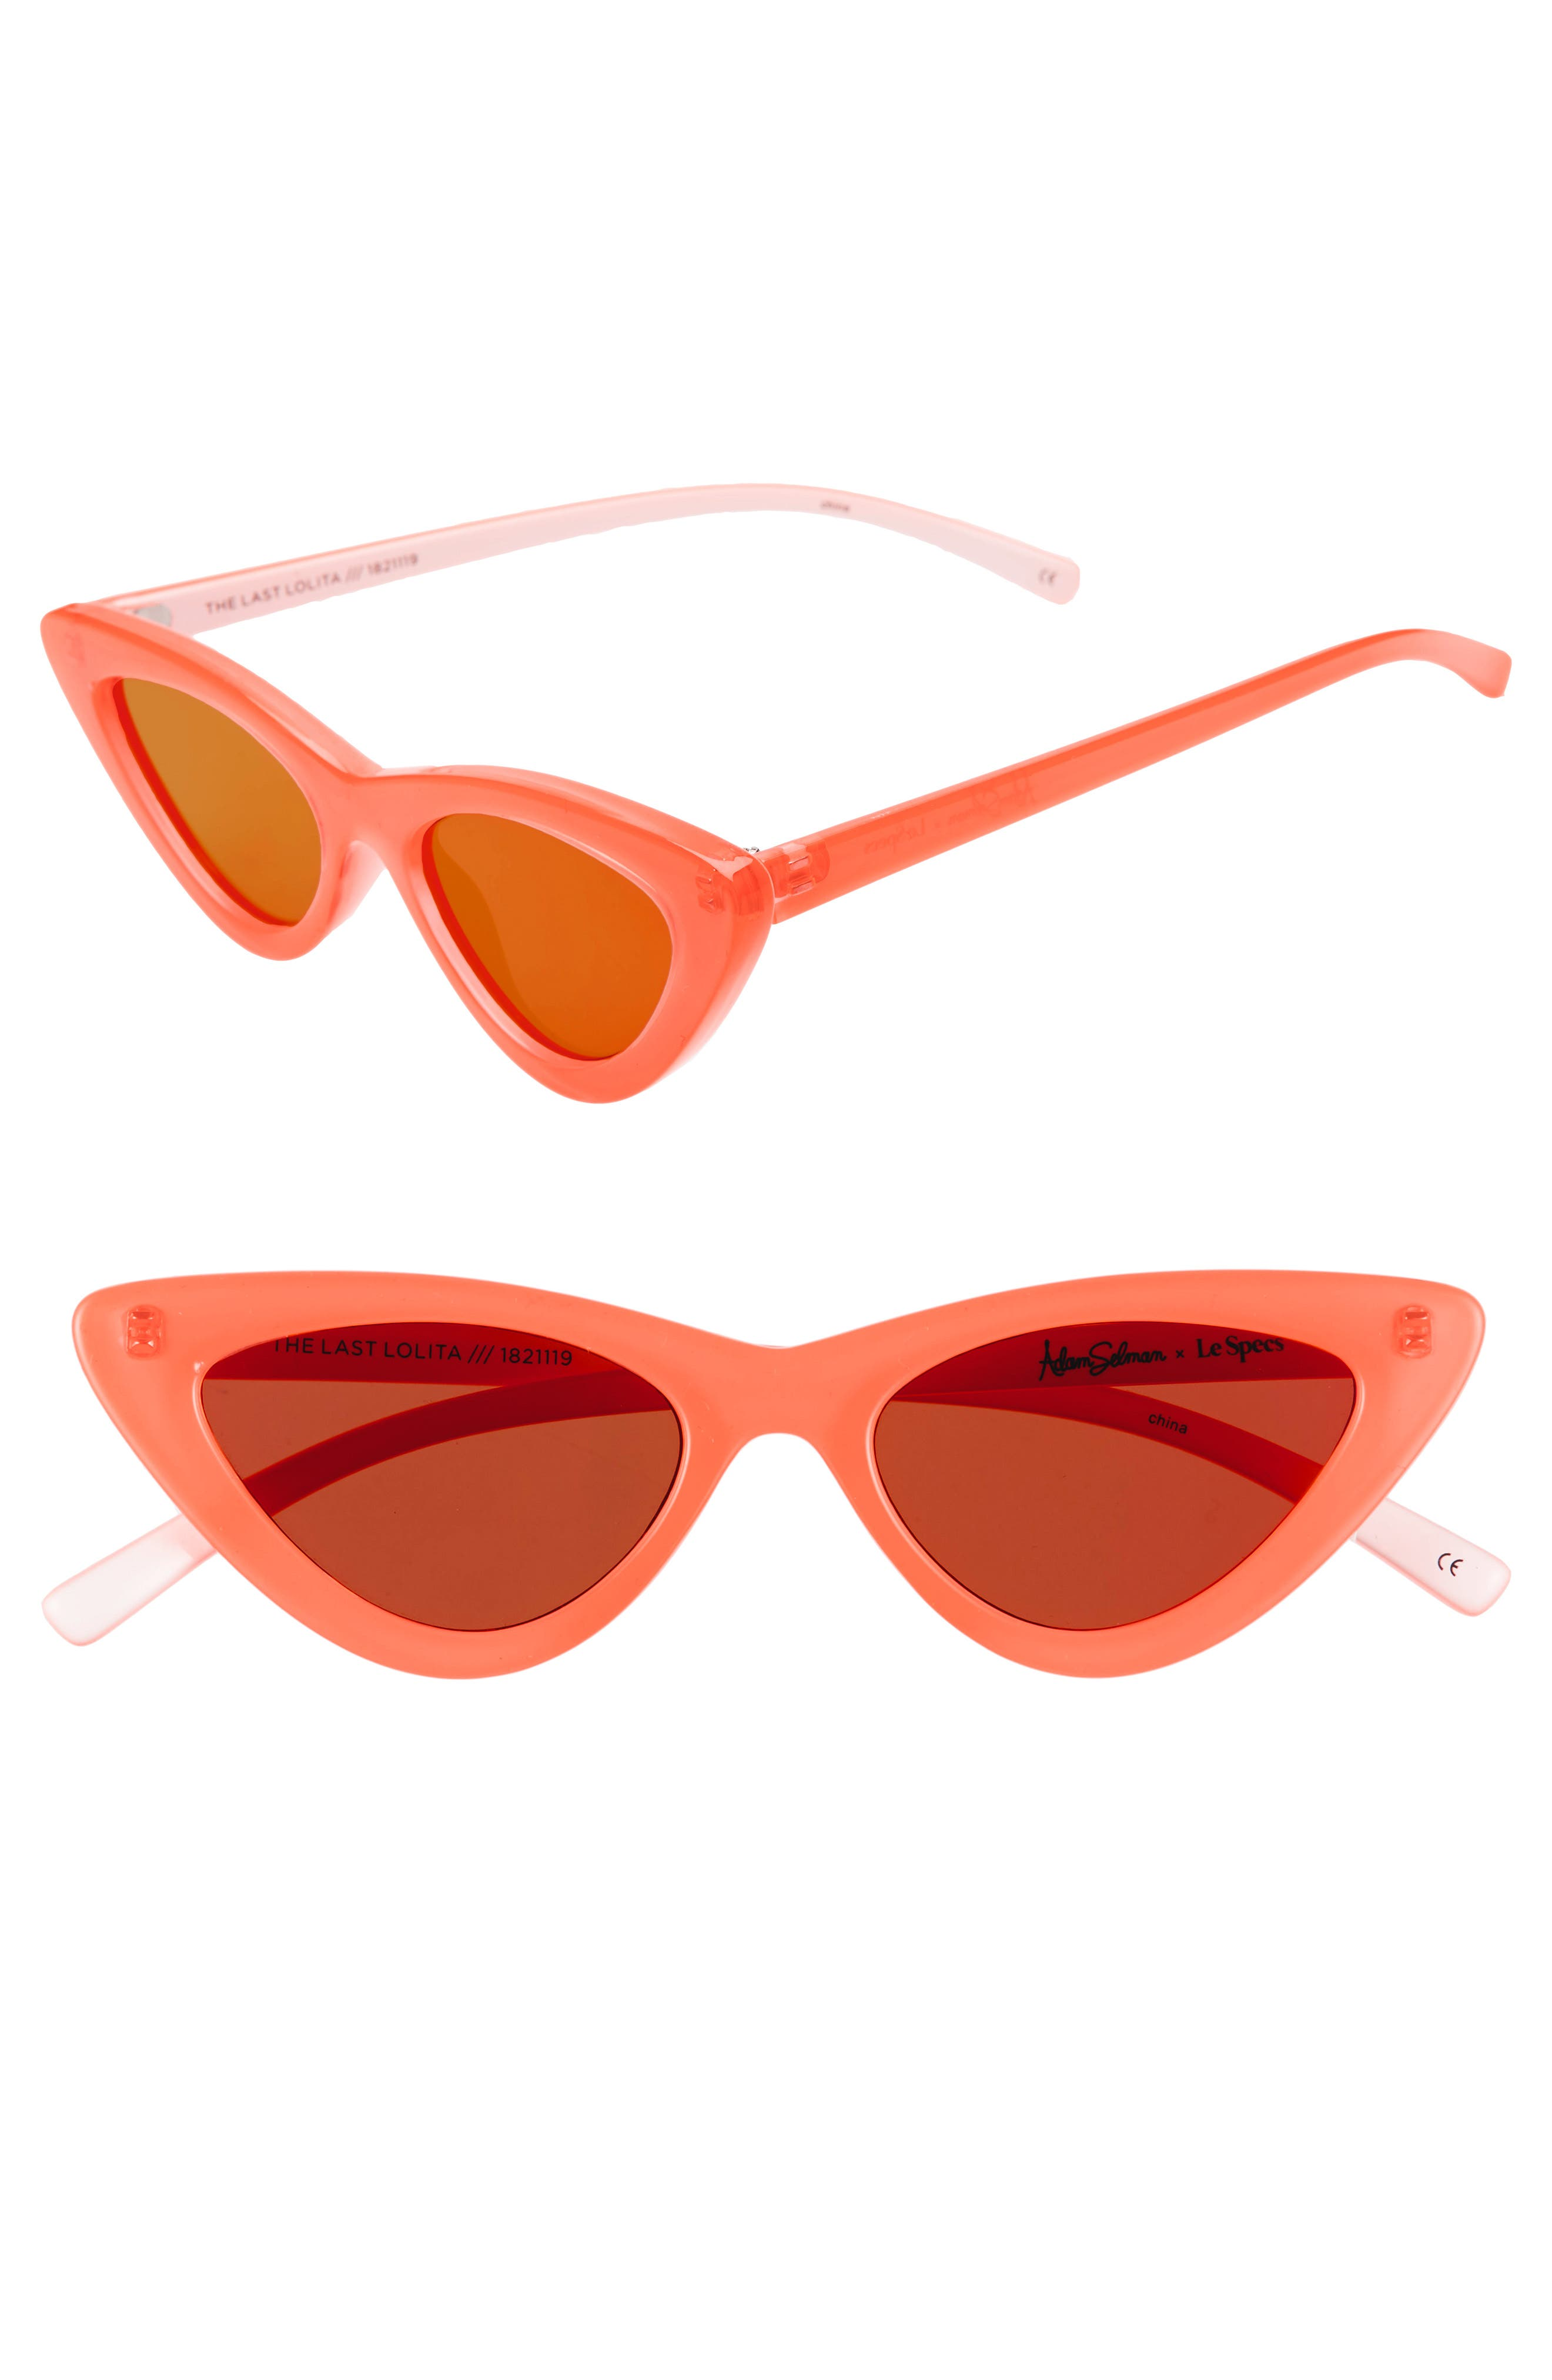 Adam Selman X Le Specs Luxe Lolita 4m Cat Eye Sunglasses - Neon Orange